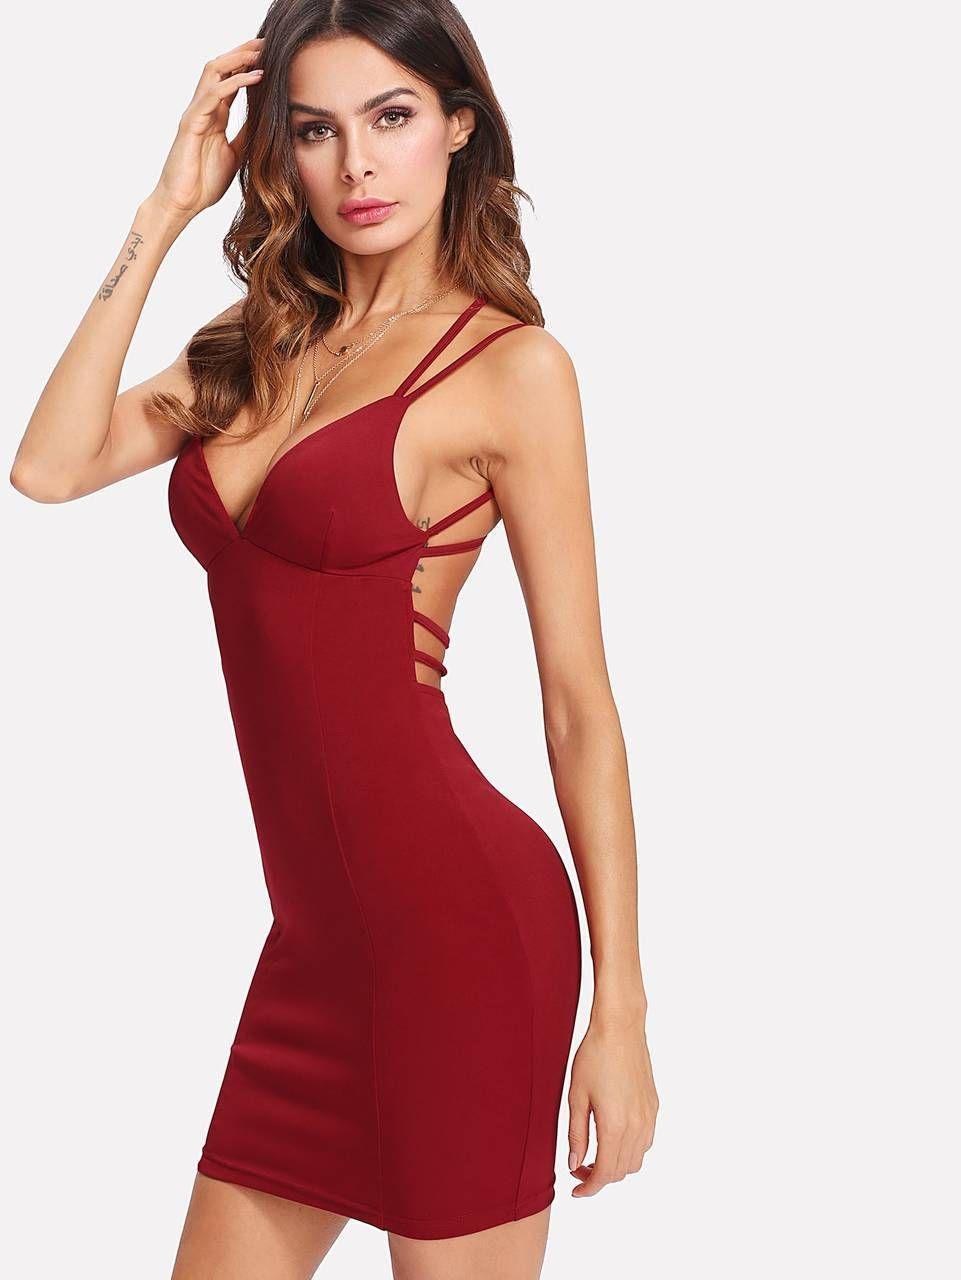 Strappy Backless Fitted Cami Dress Burgundy Bodycon Dress Cami Dress Fashion [ 1280 x 961 Pixel ]